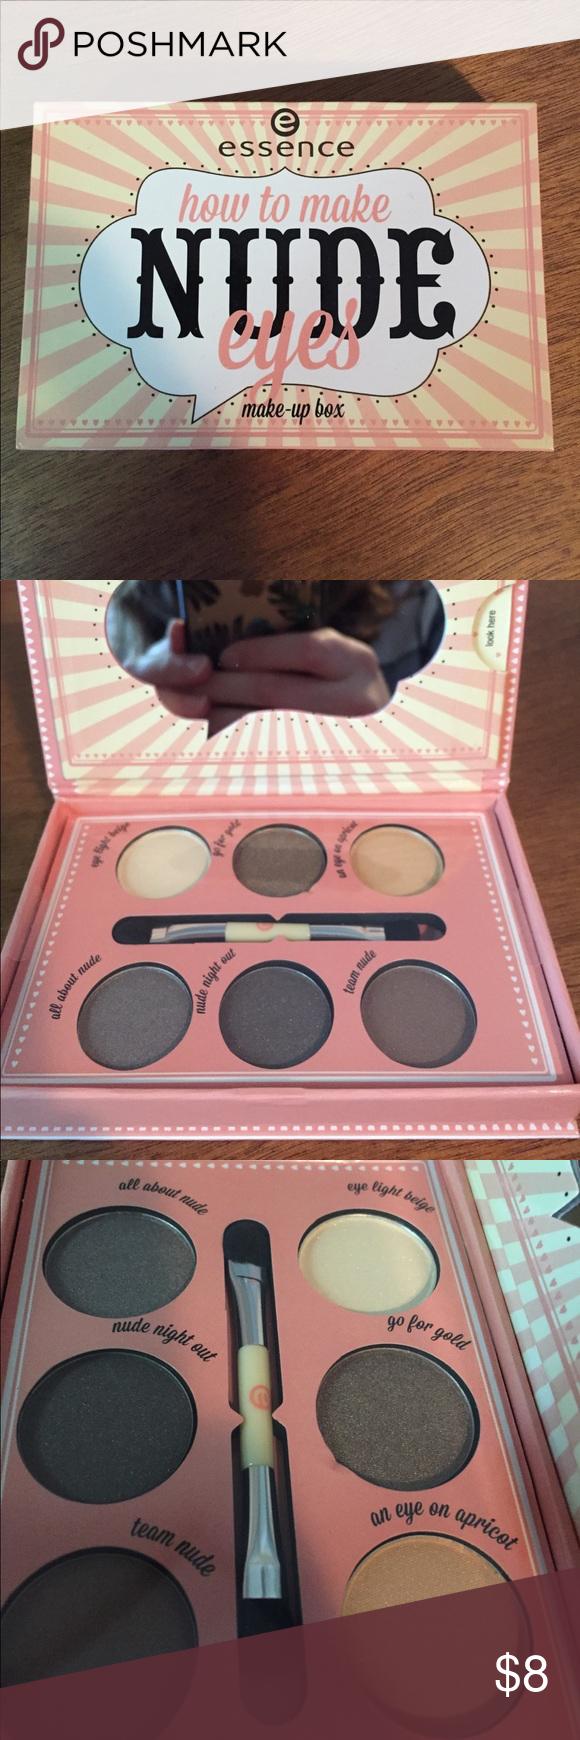 NWOT Essence Nude Eyes palette Sephora • essence • nude eyes • palette • 6 shades • double sided brush (foam side and blending side) Sephora Makeup Eyeshadow